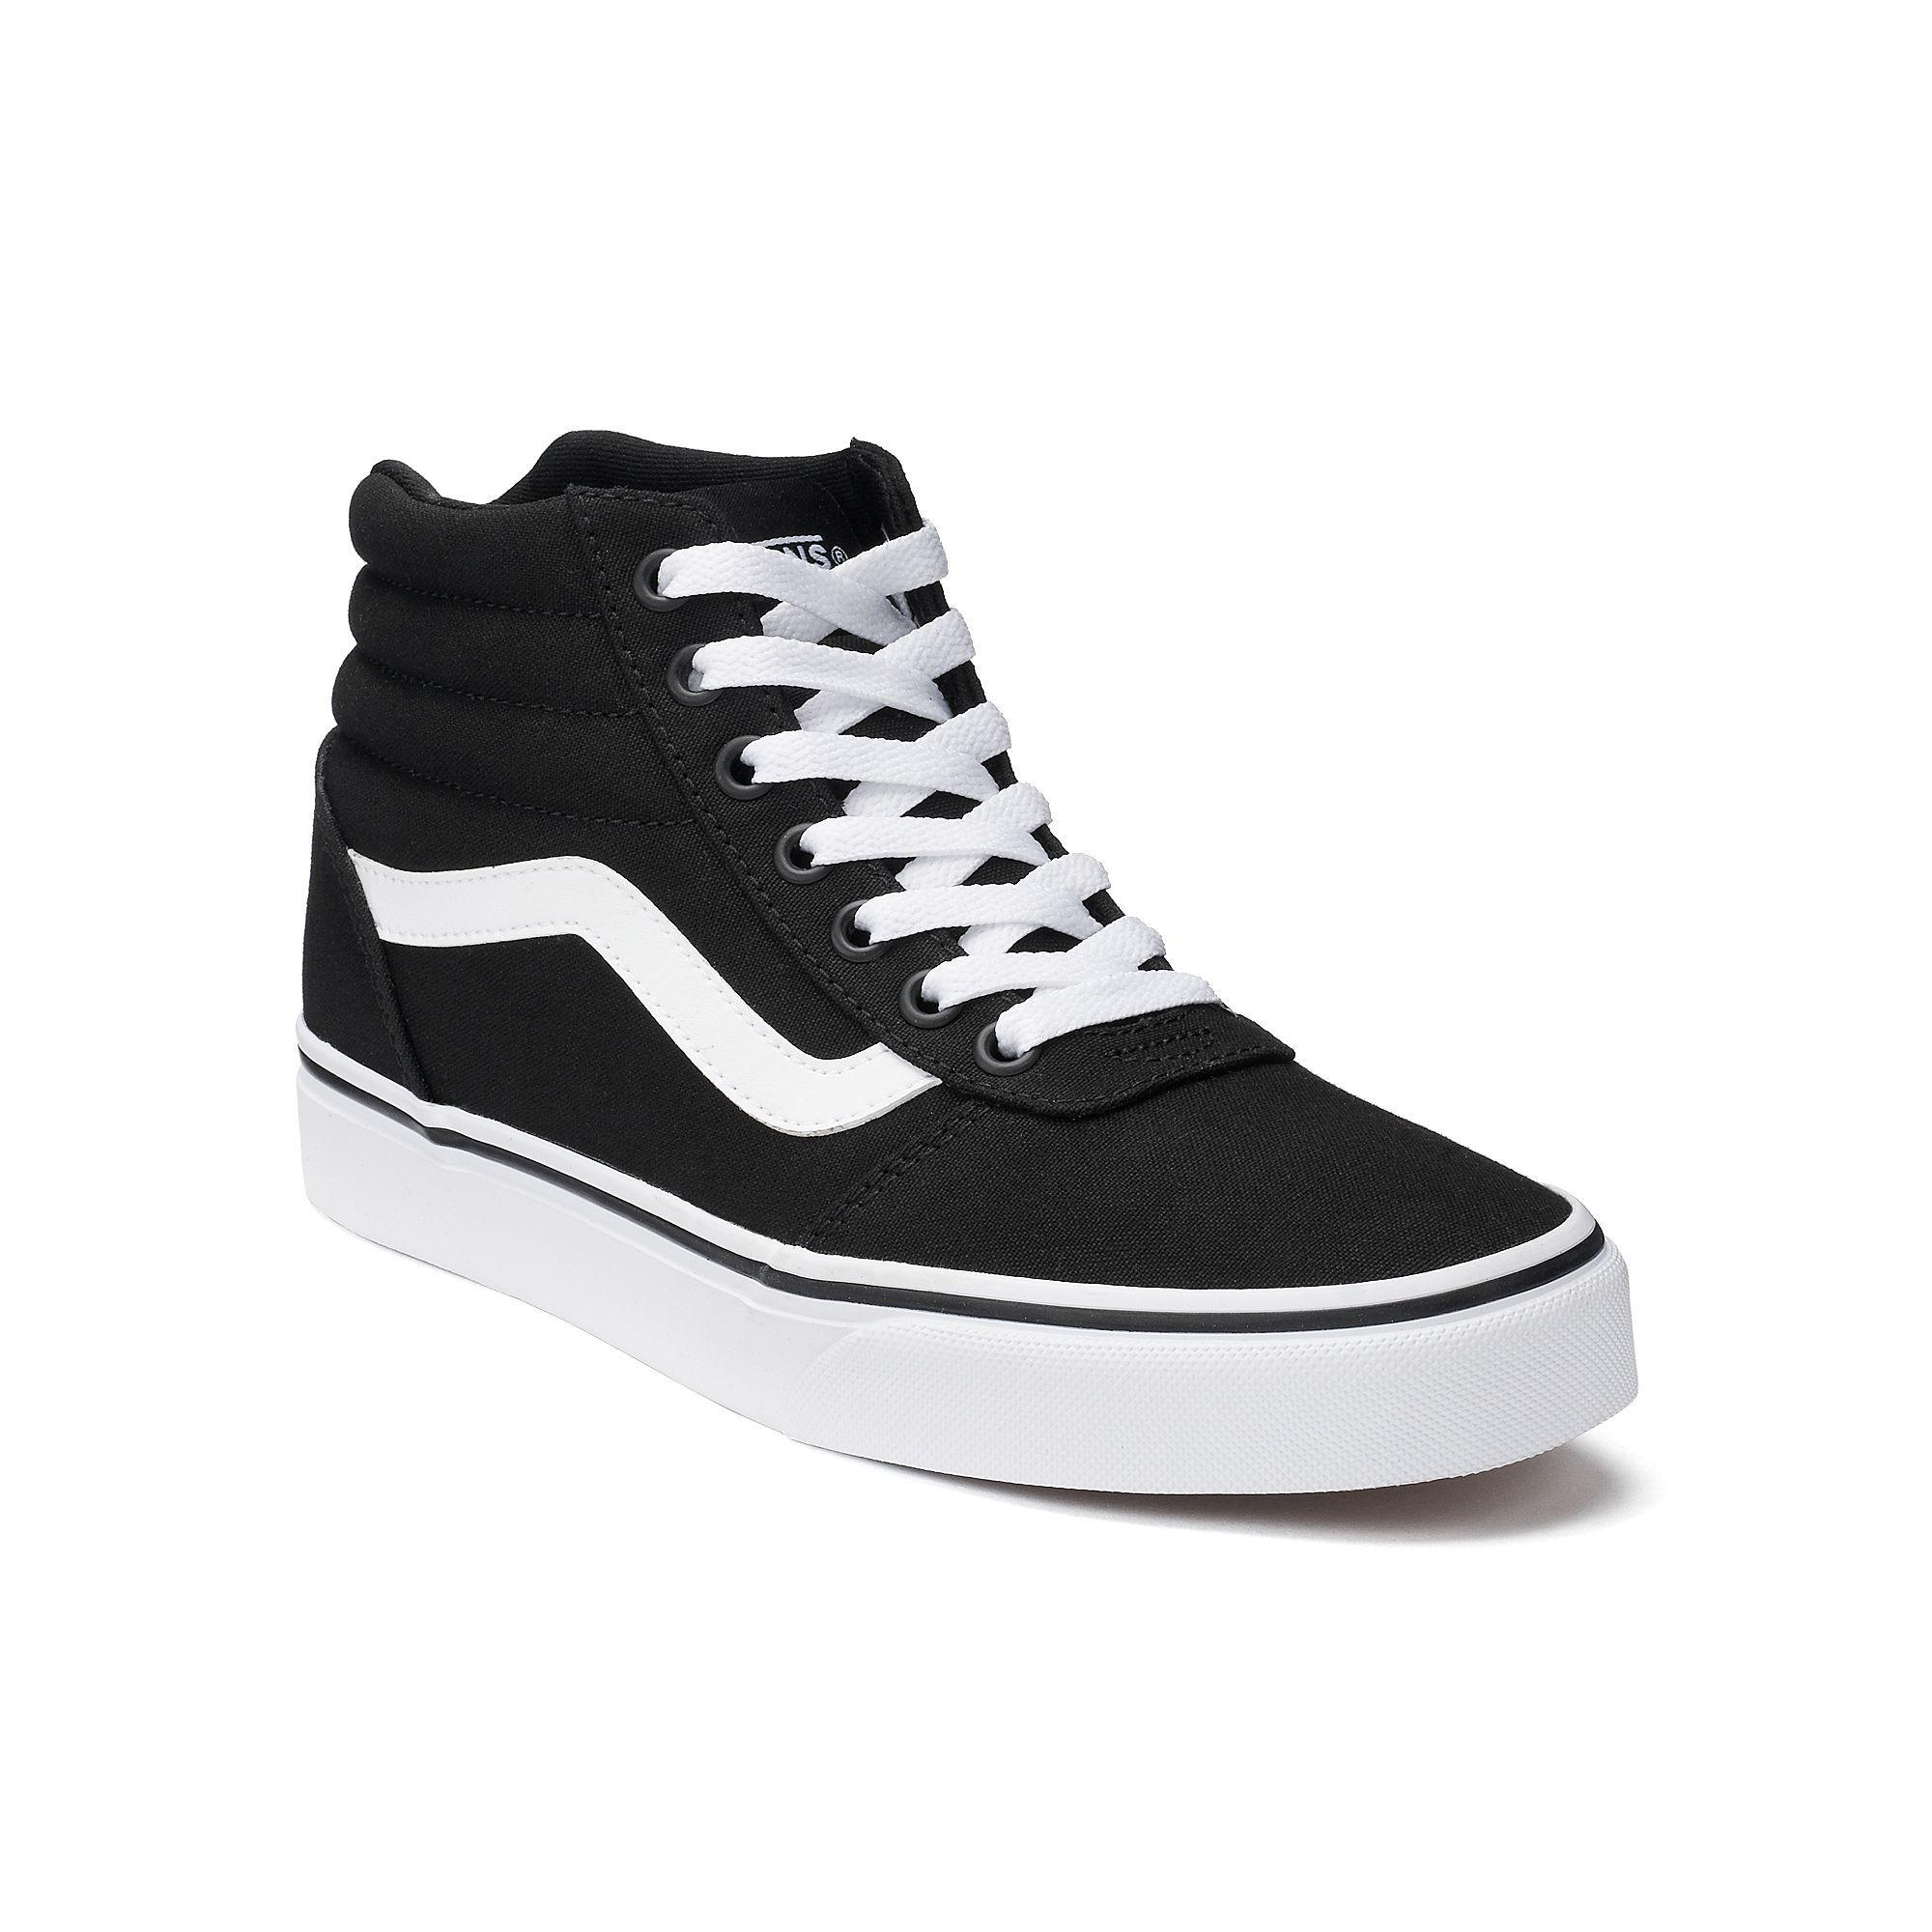 Ward Hi Women US 8.5 Black Skate Shoe